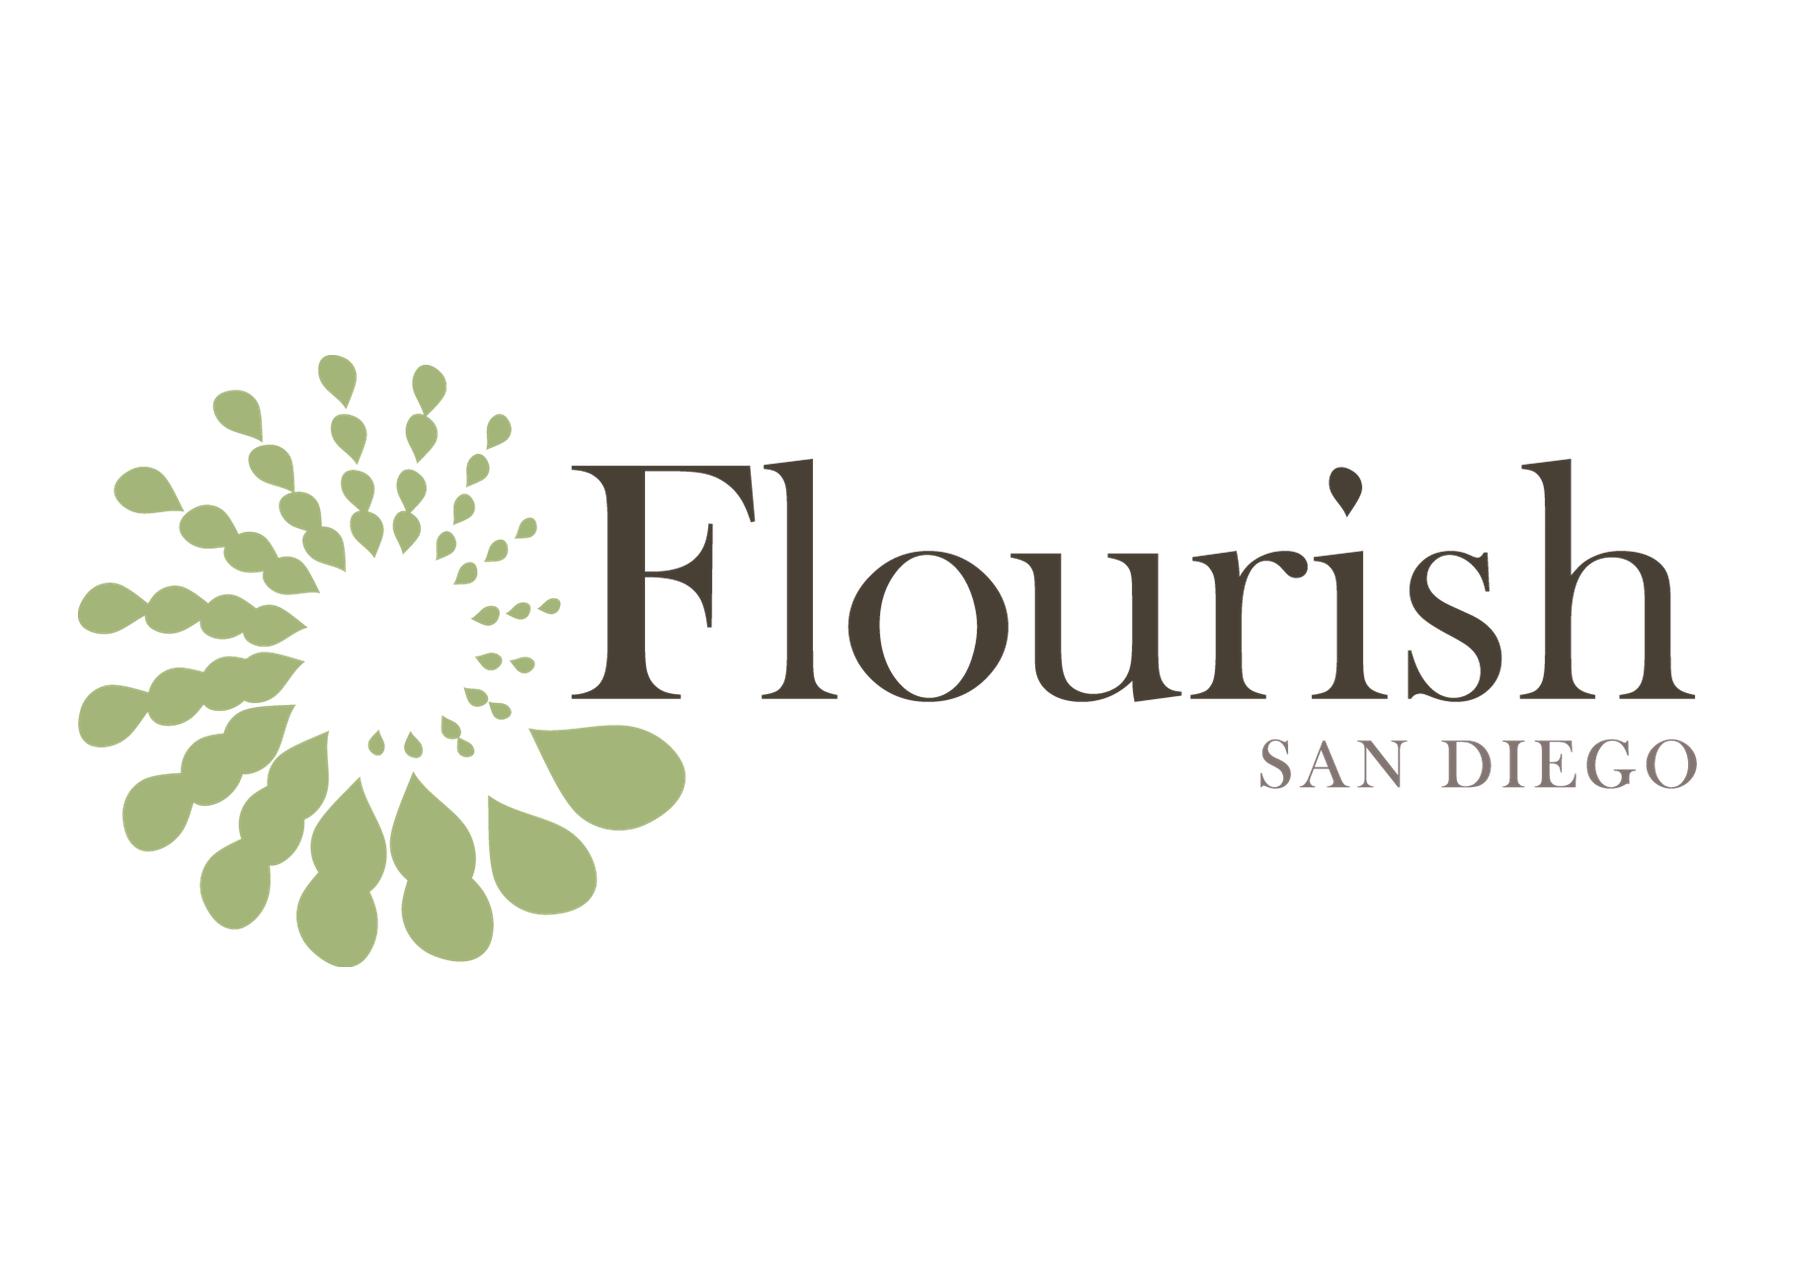 Flourish San Diego